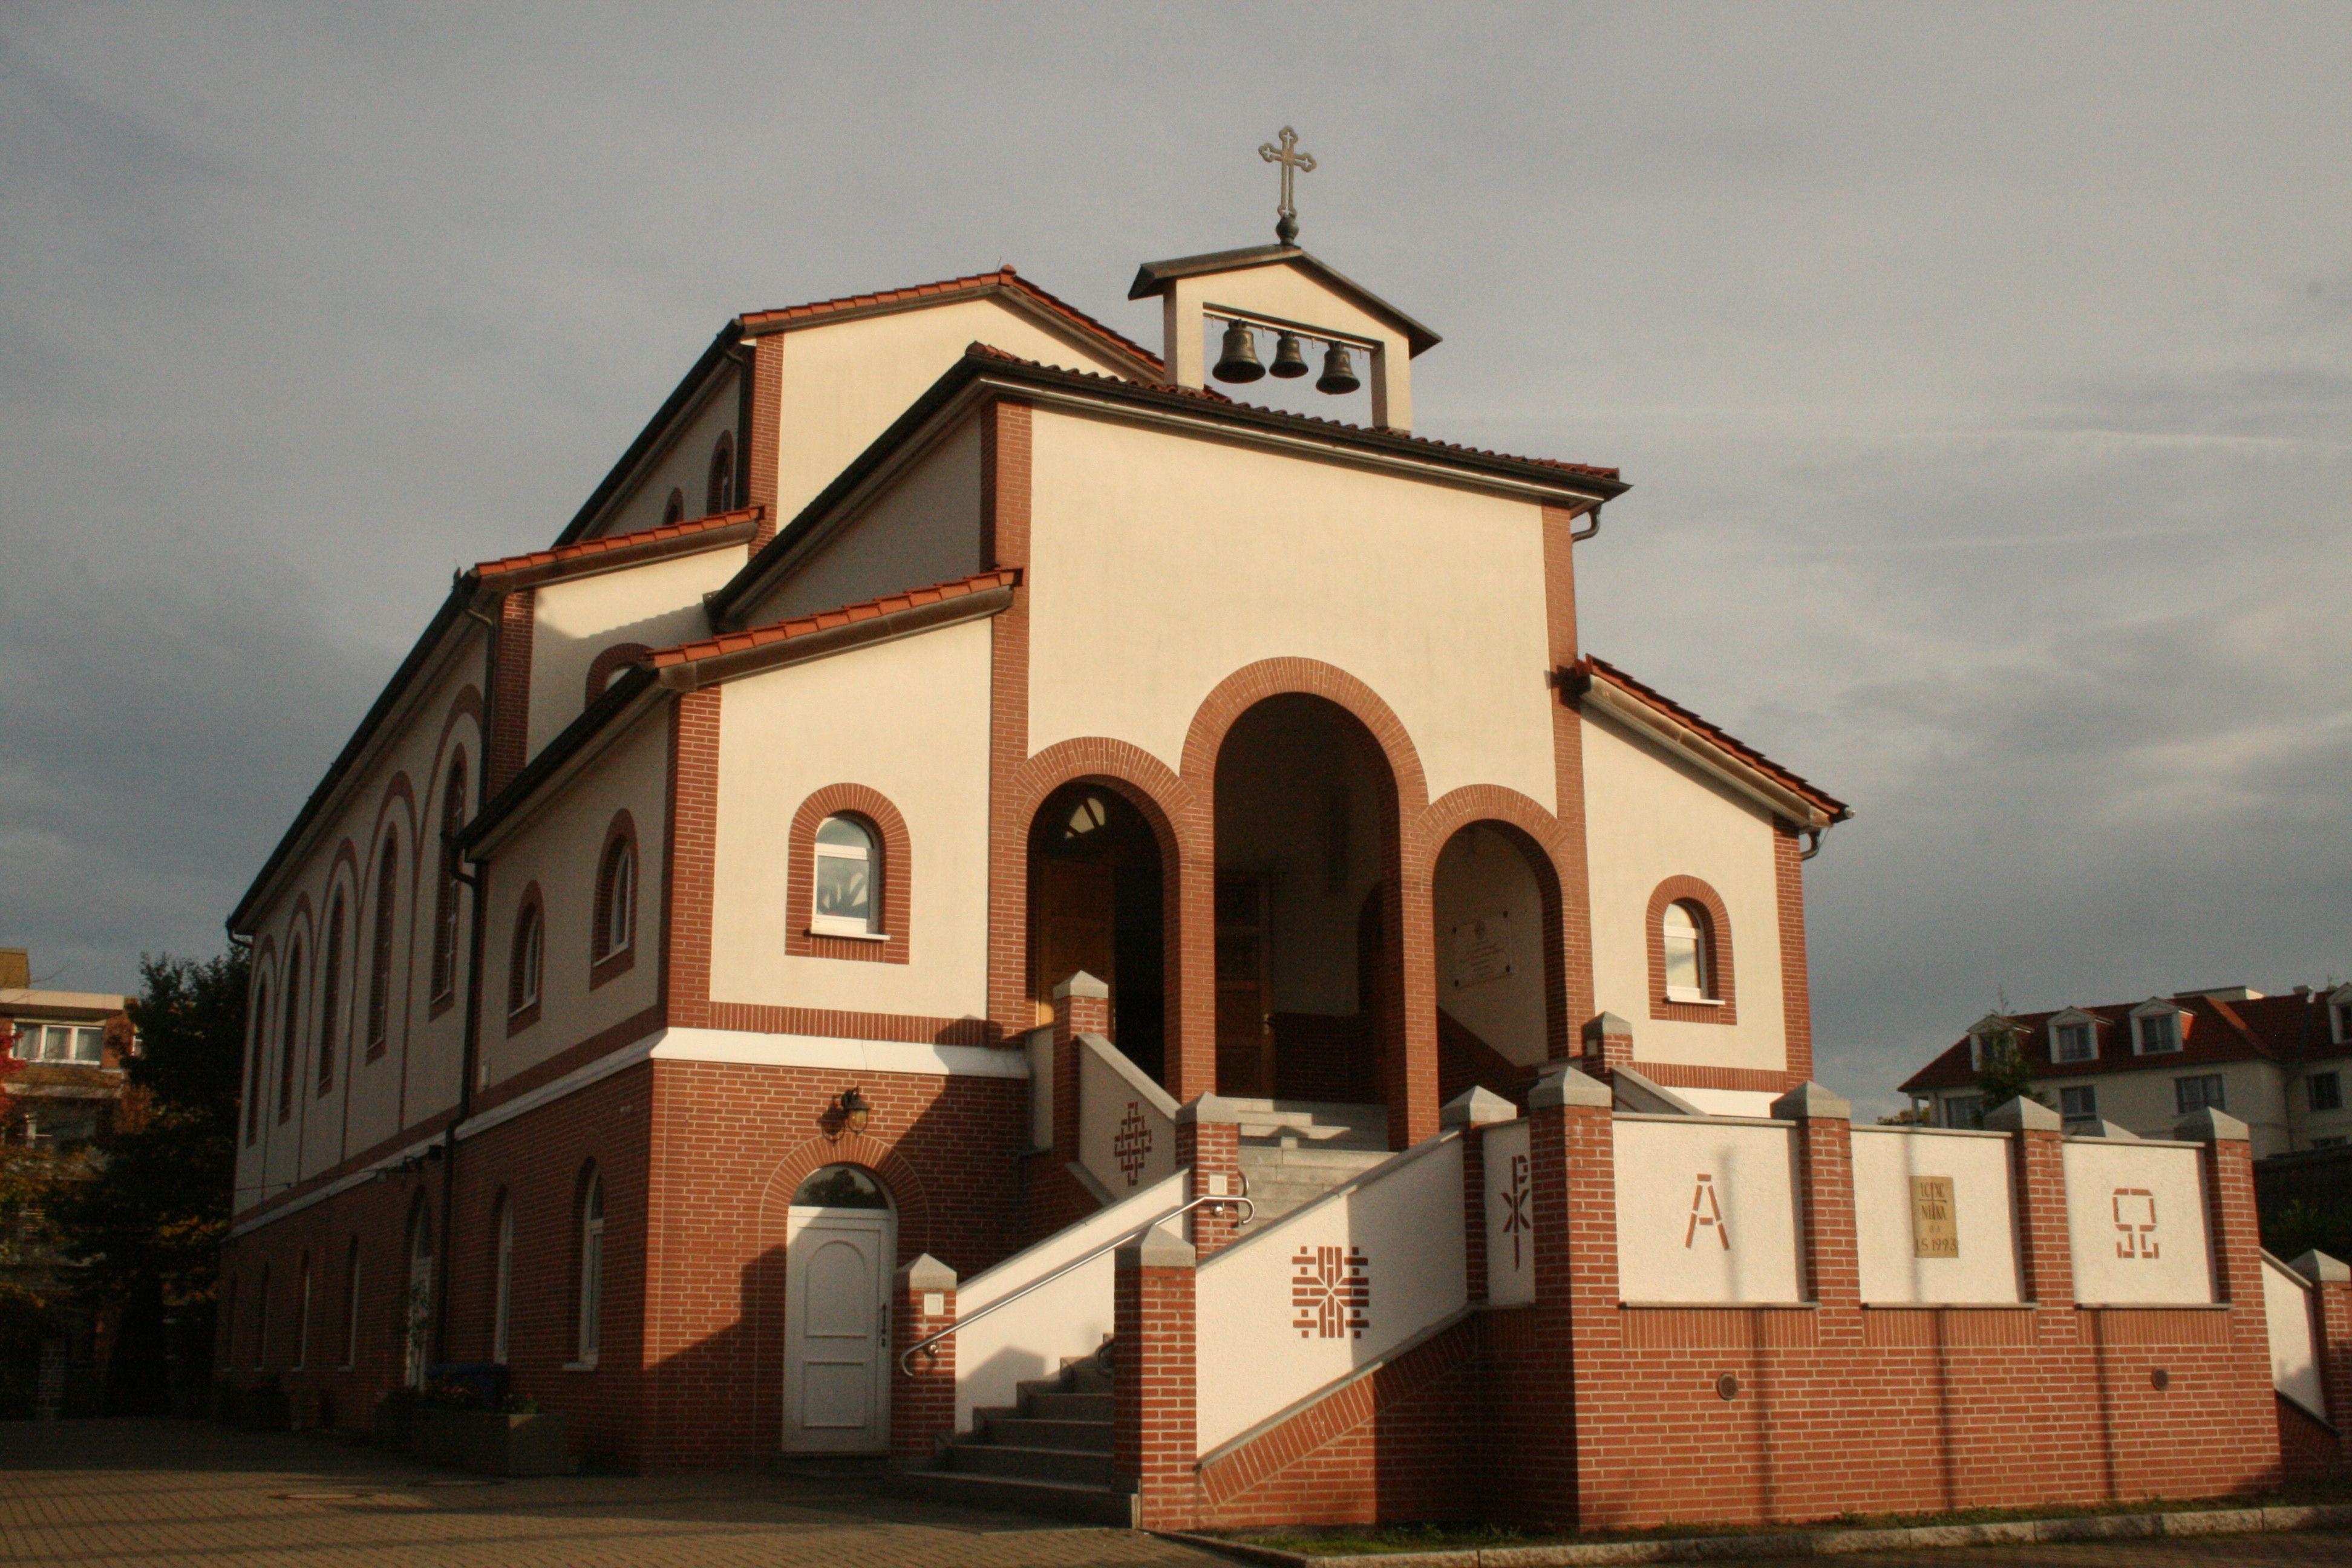 File:Griechisch-orthodoxe Kirche Hannover-List.jpg